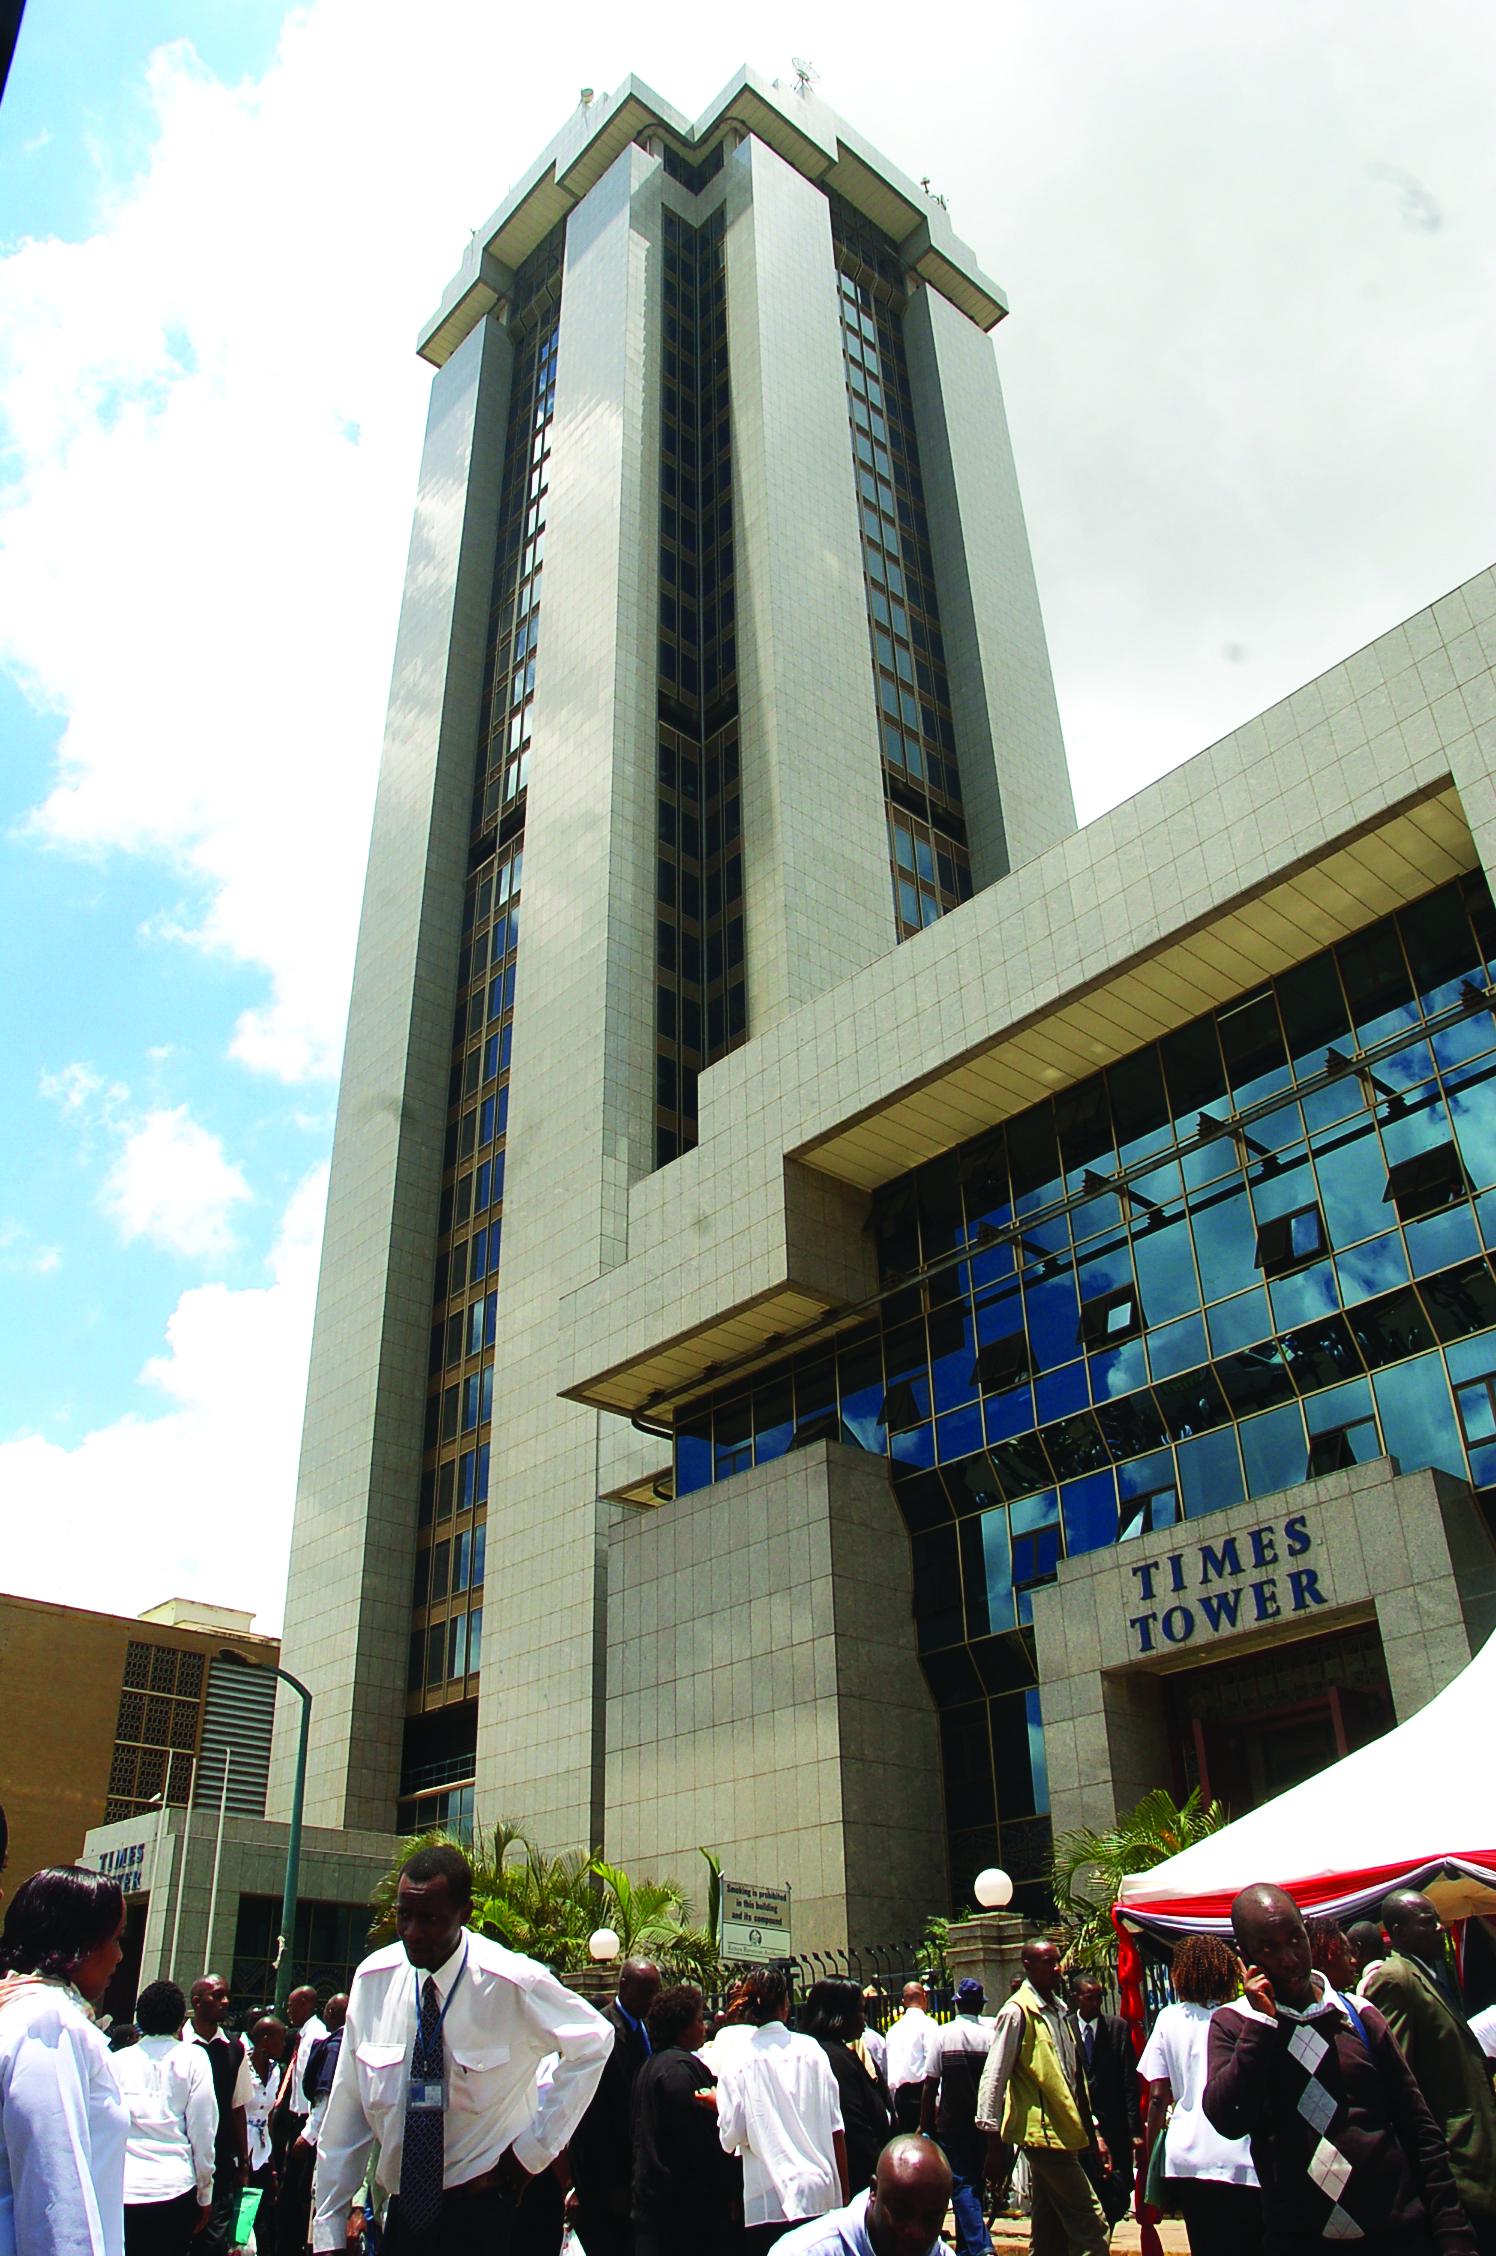 Massive fraud at local bank, millions lost